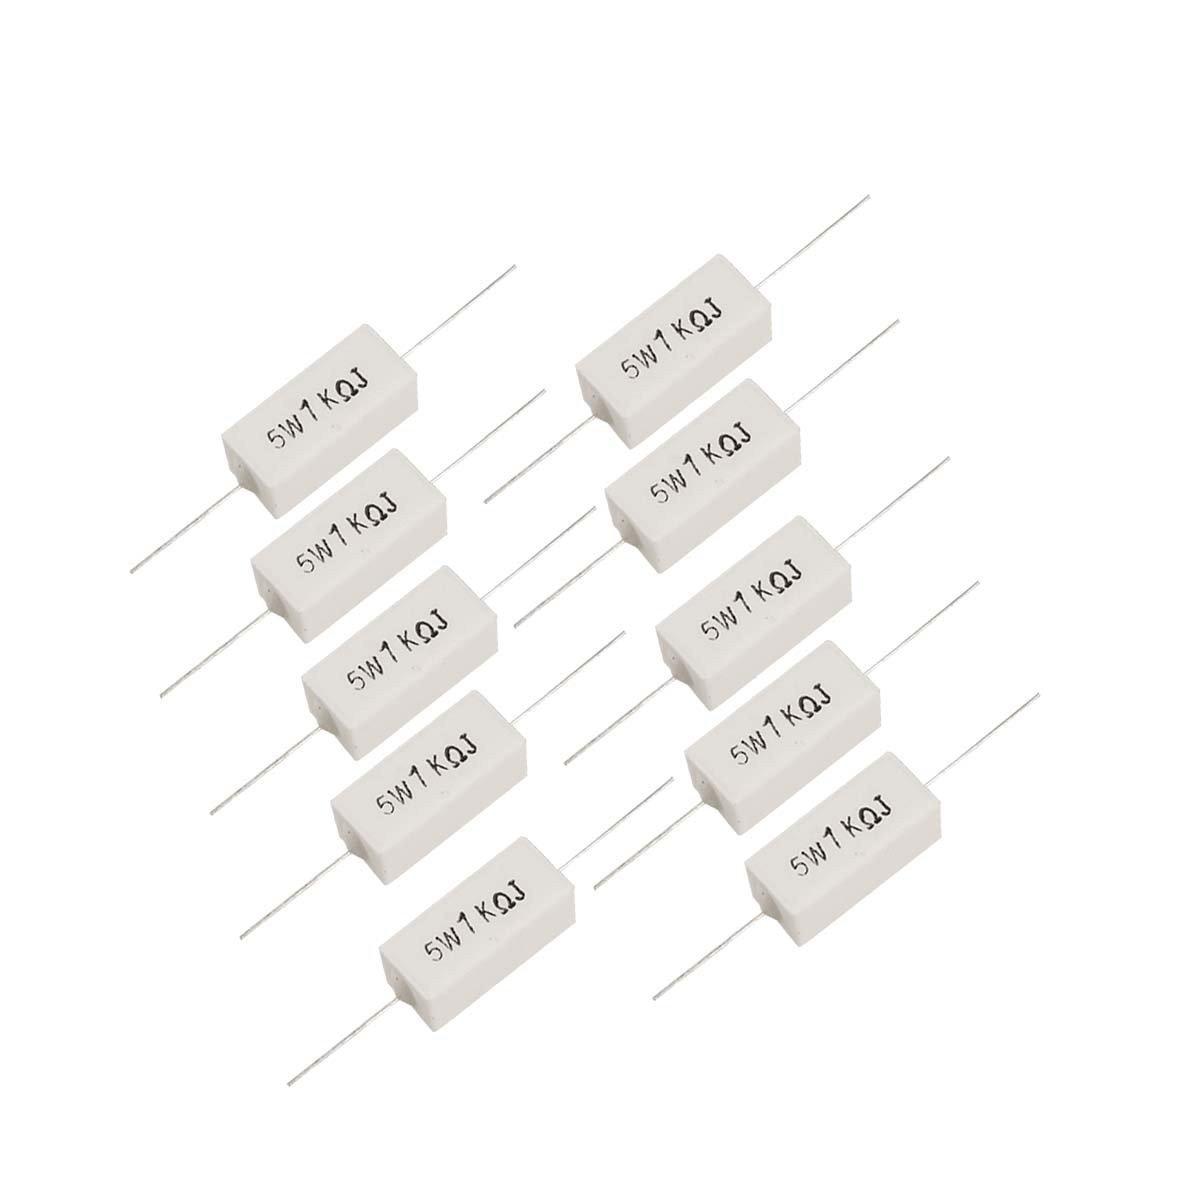 Saim 10 Pcs Ceramic Cement Power Resistor 5W Watts 1K Ohm 5% XC00036